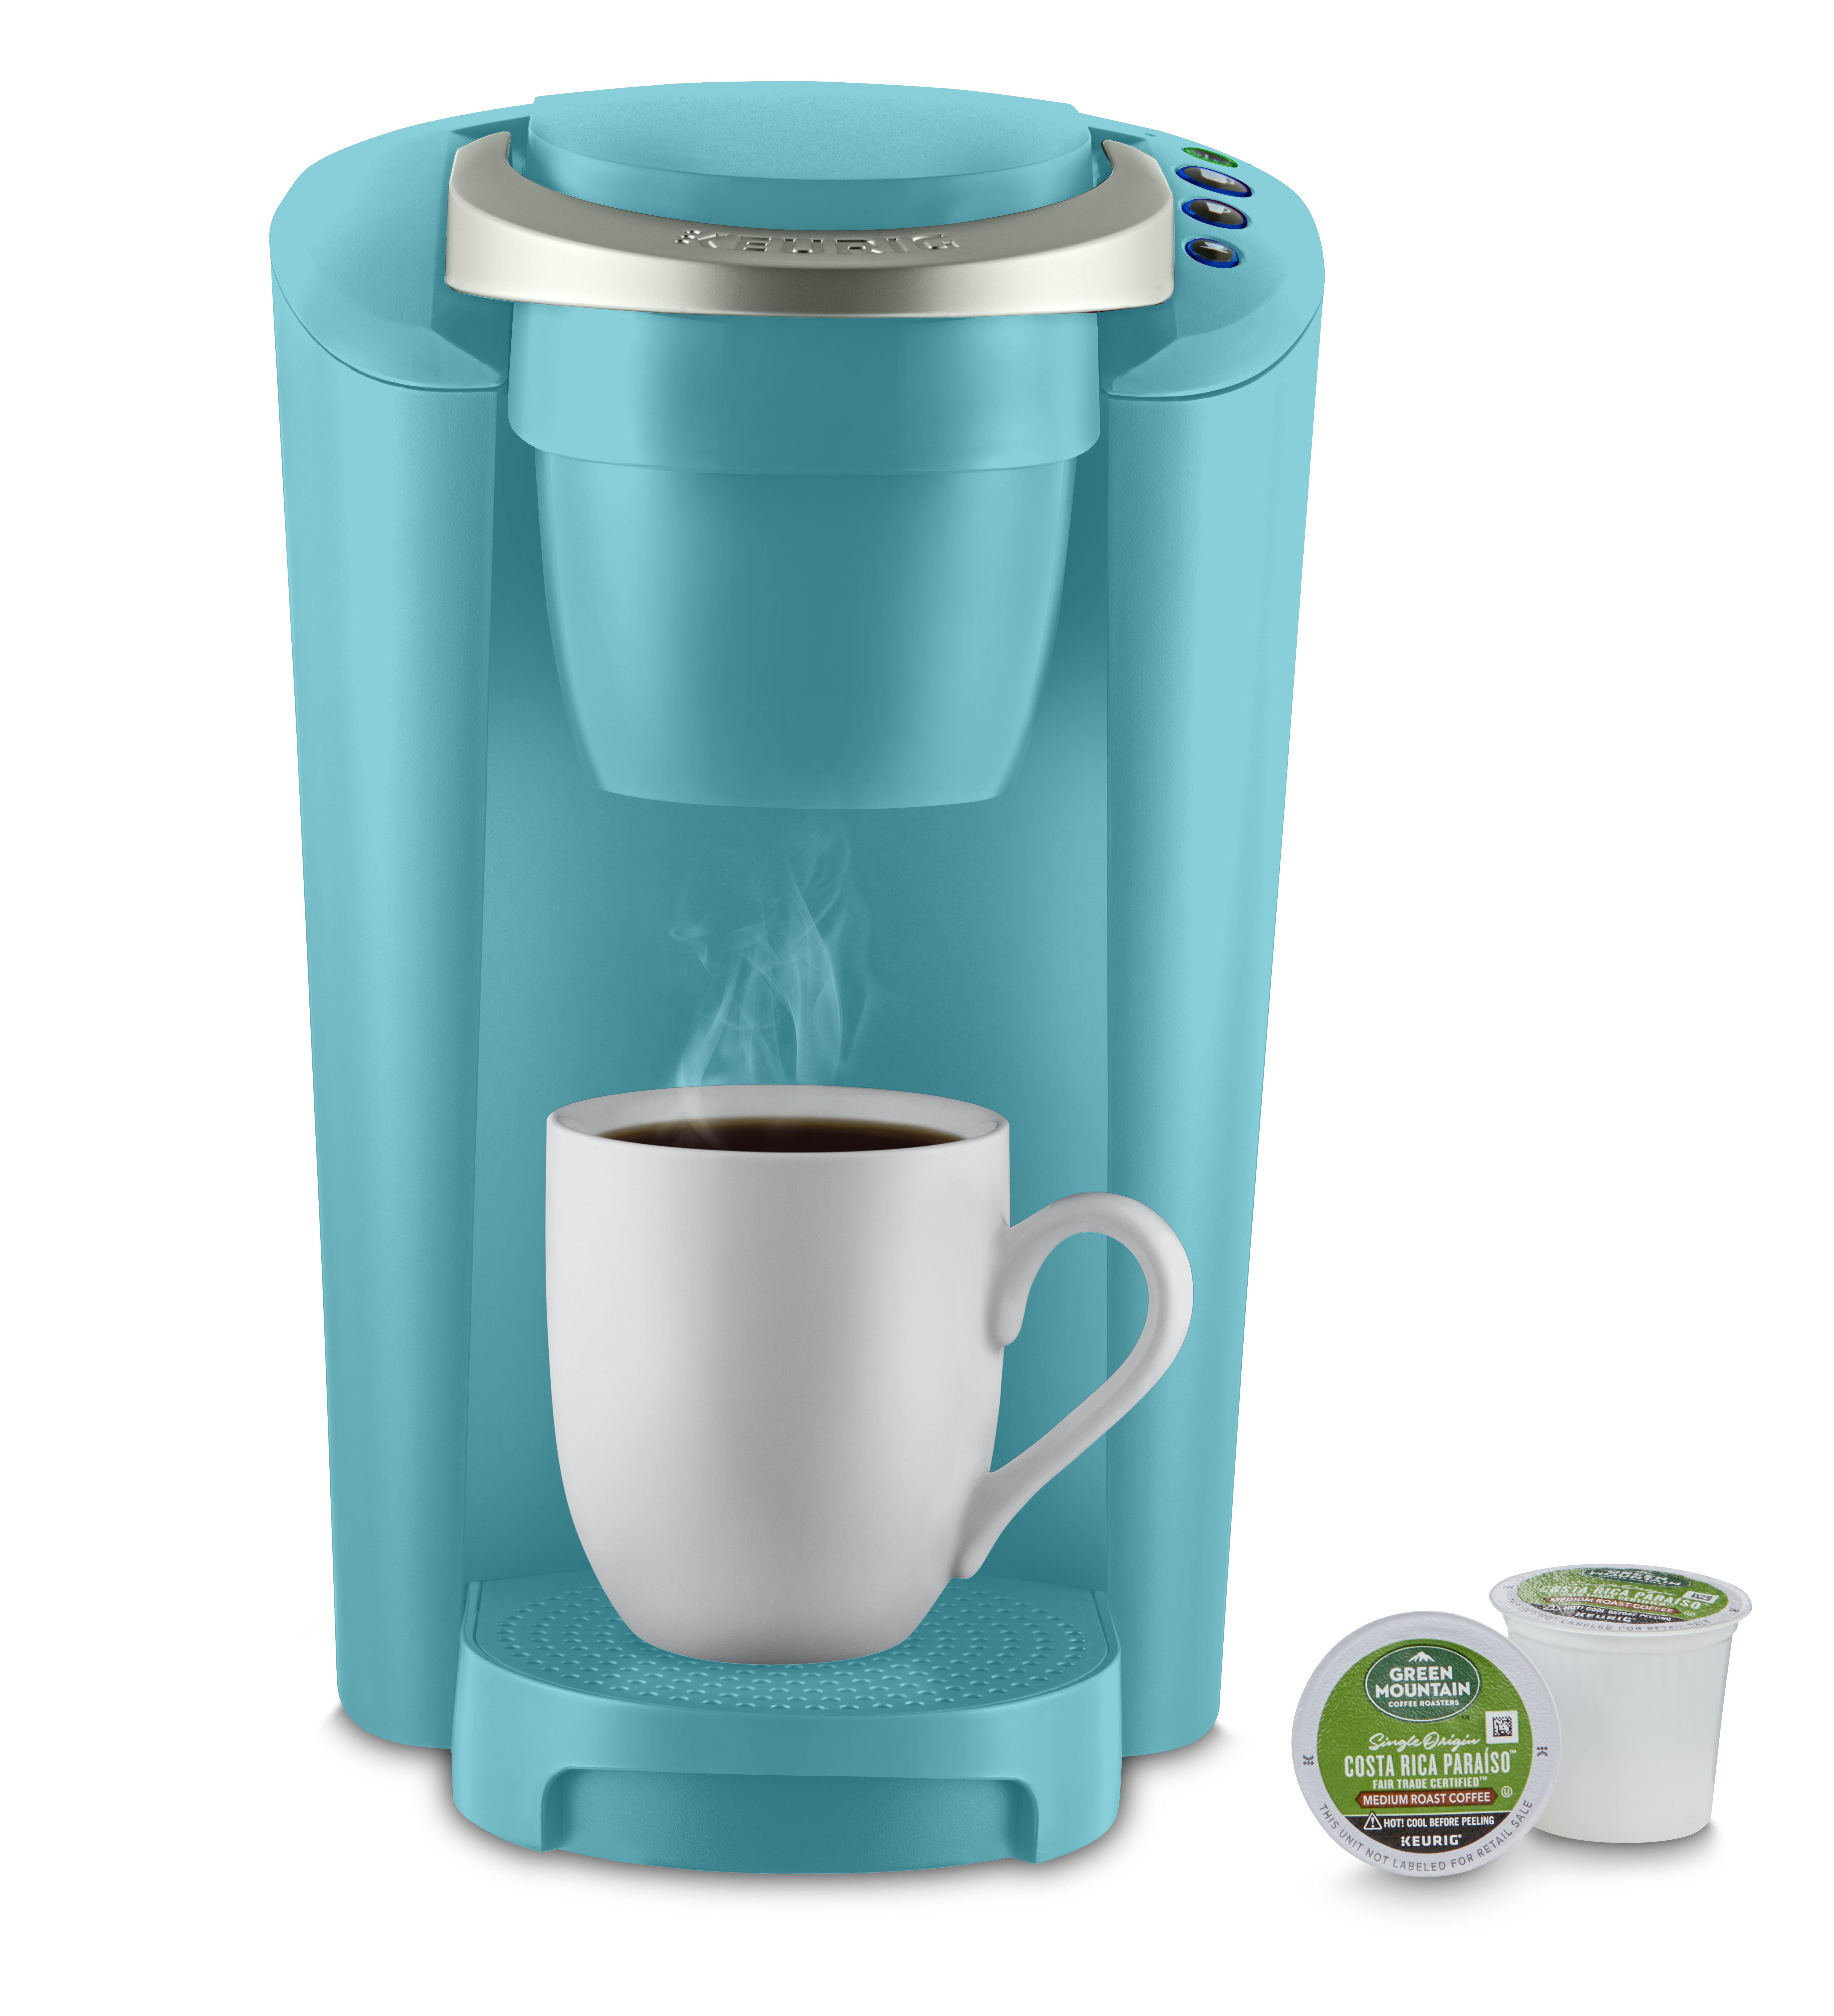 Keurig Coffee Maker K Compact Single Serve K Cup Pod Brewing